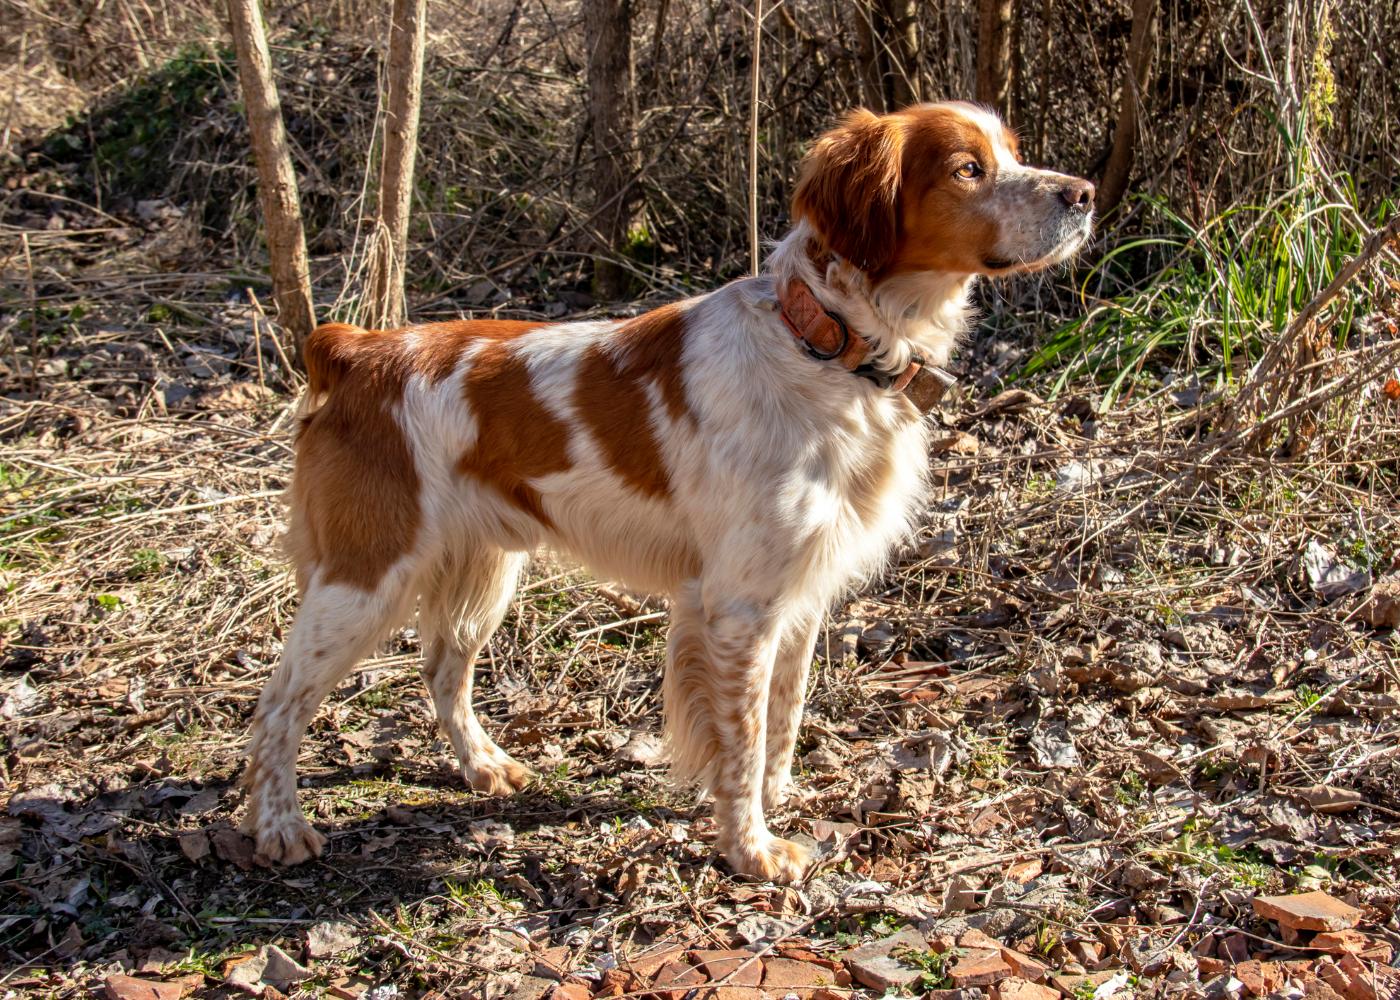 cão épagneul breton no monte a passear